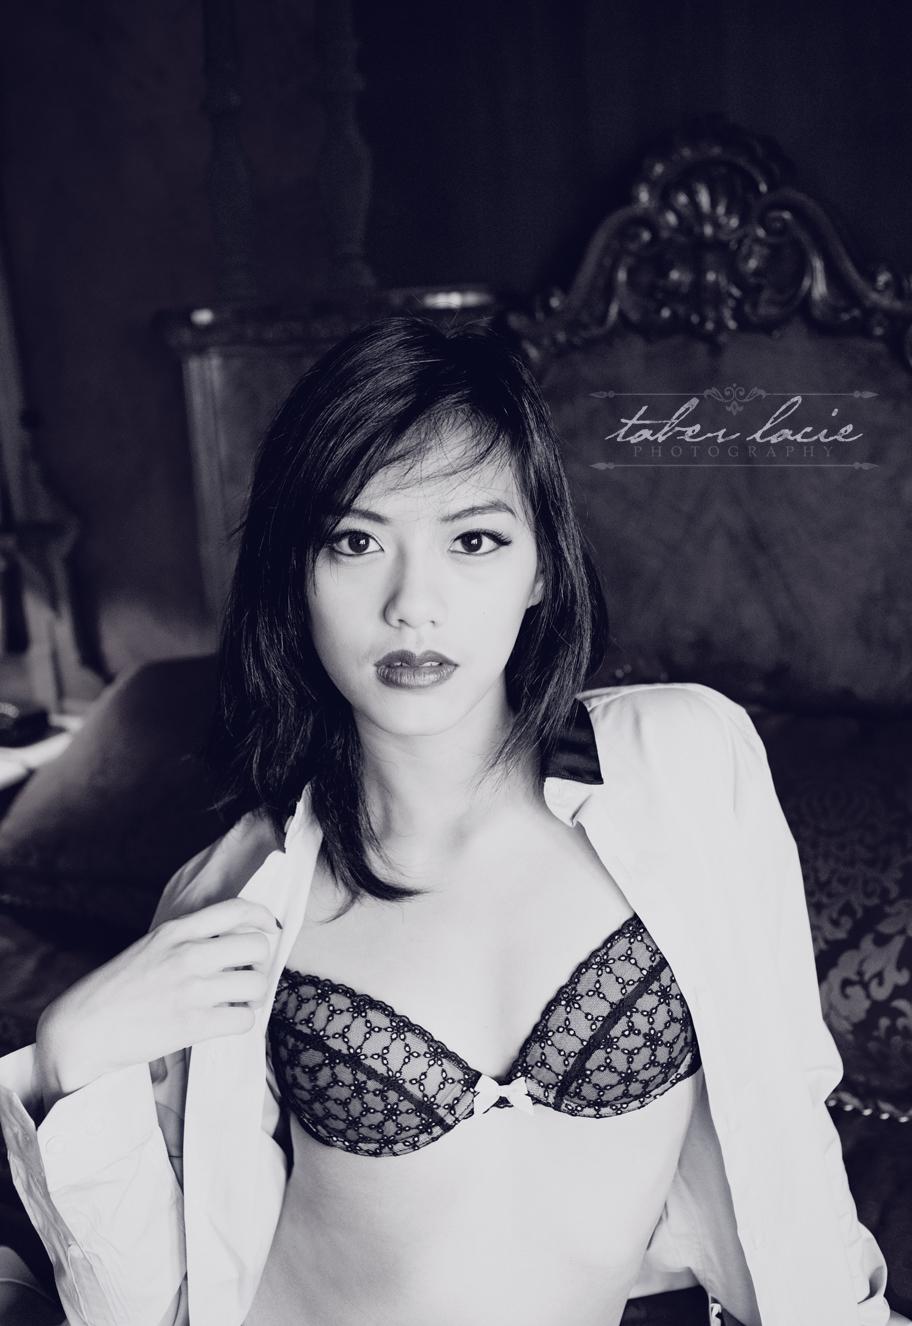 boudoir photography - milwaukee wi photographer - taber lacie photography - R003.jpg